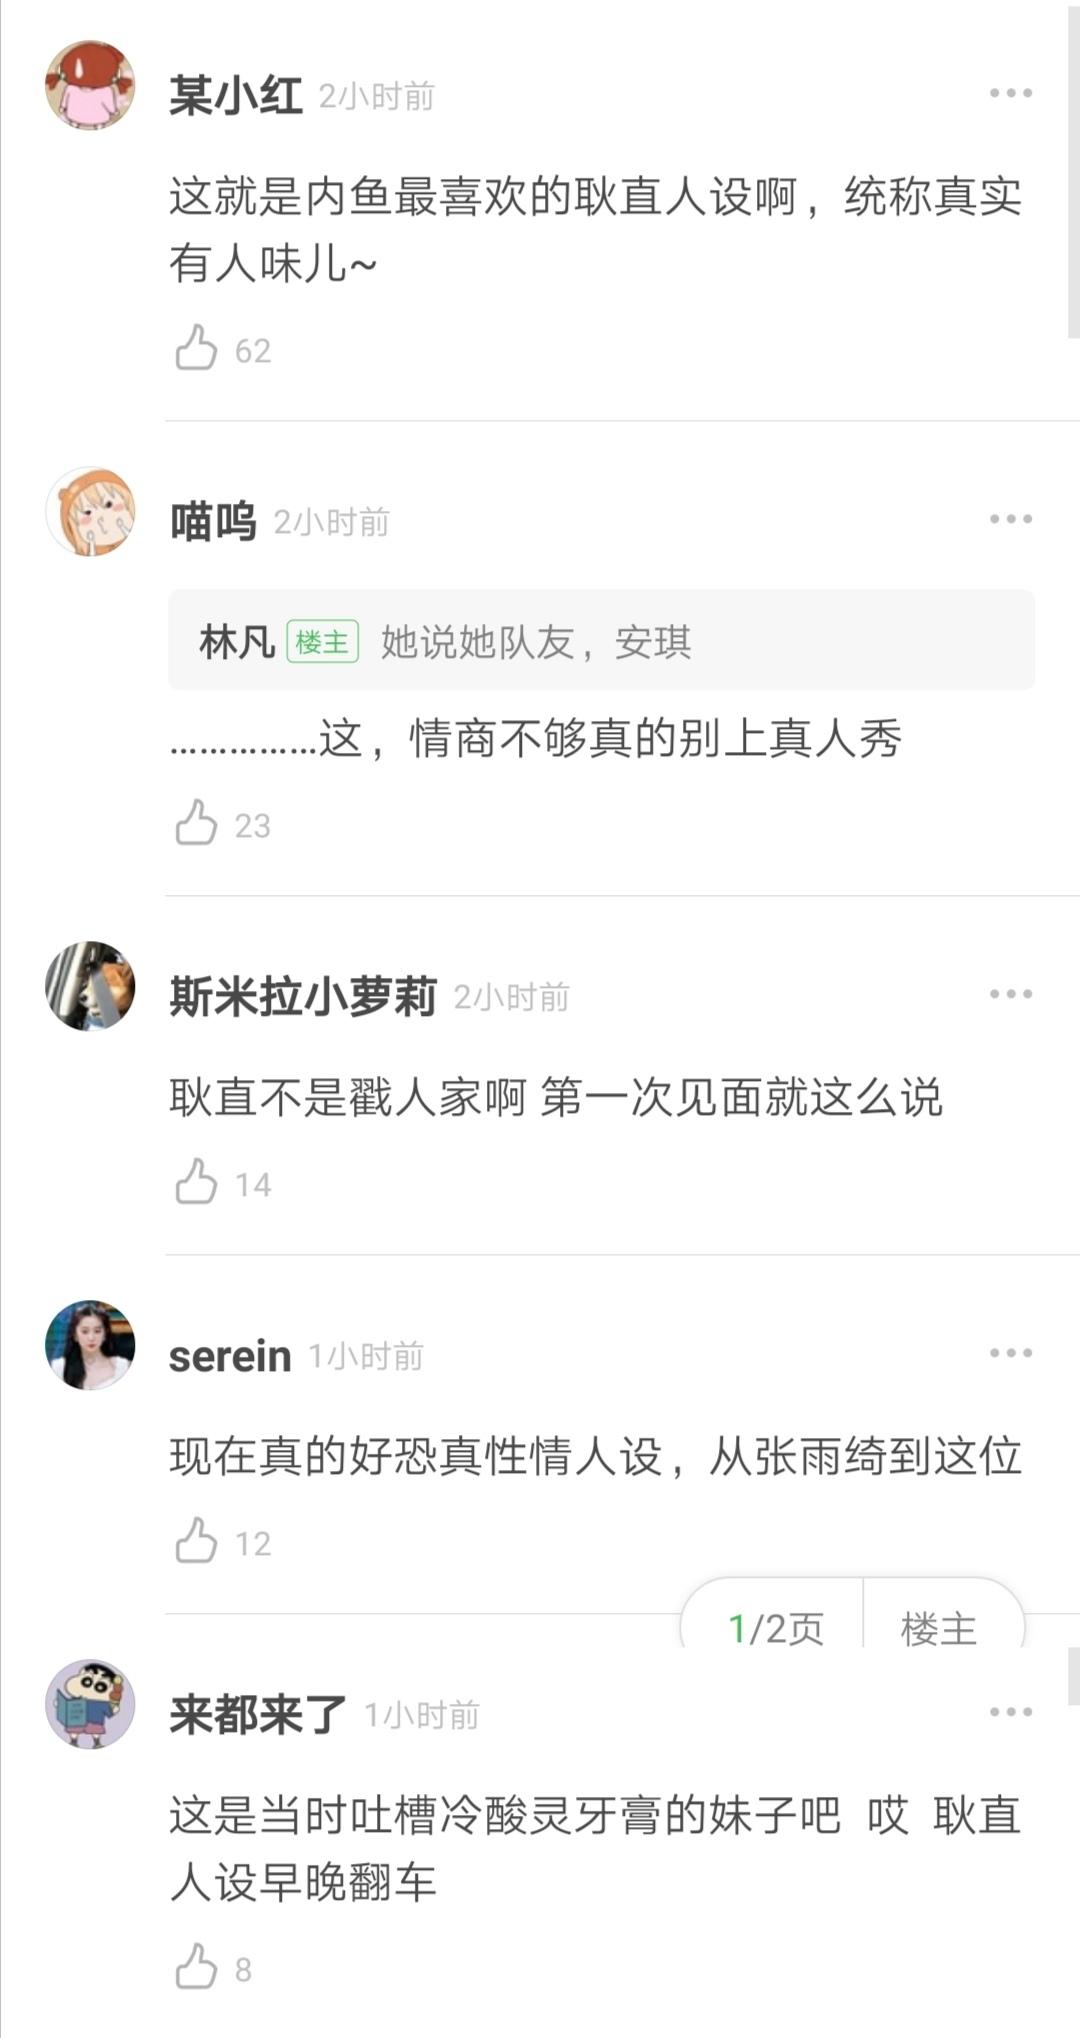 THE9赵小棠人设再次翻车,当众调侃安崎,低情商还是真性情?